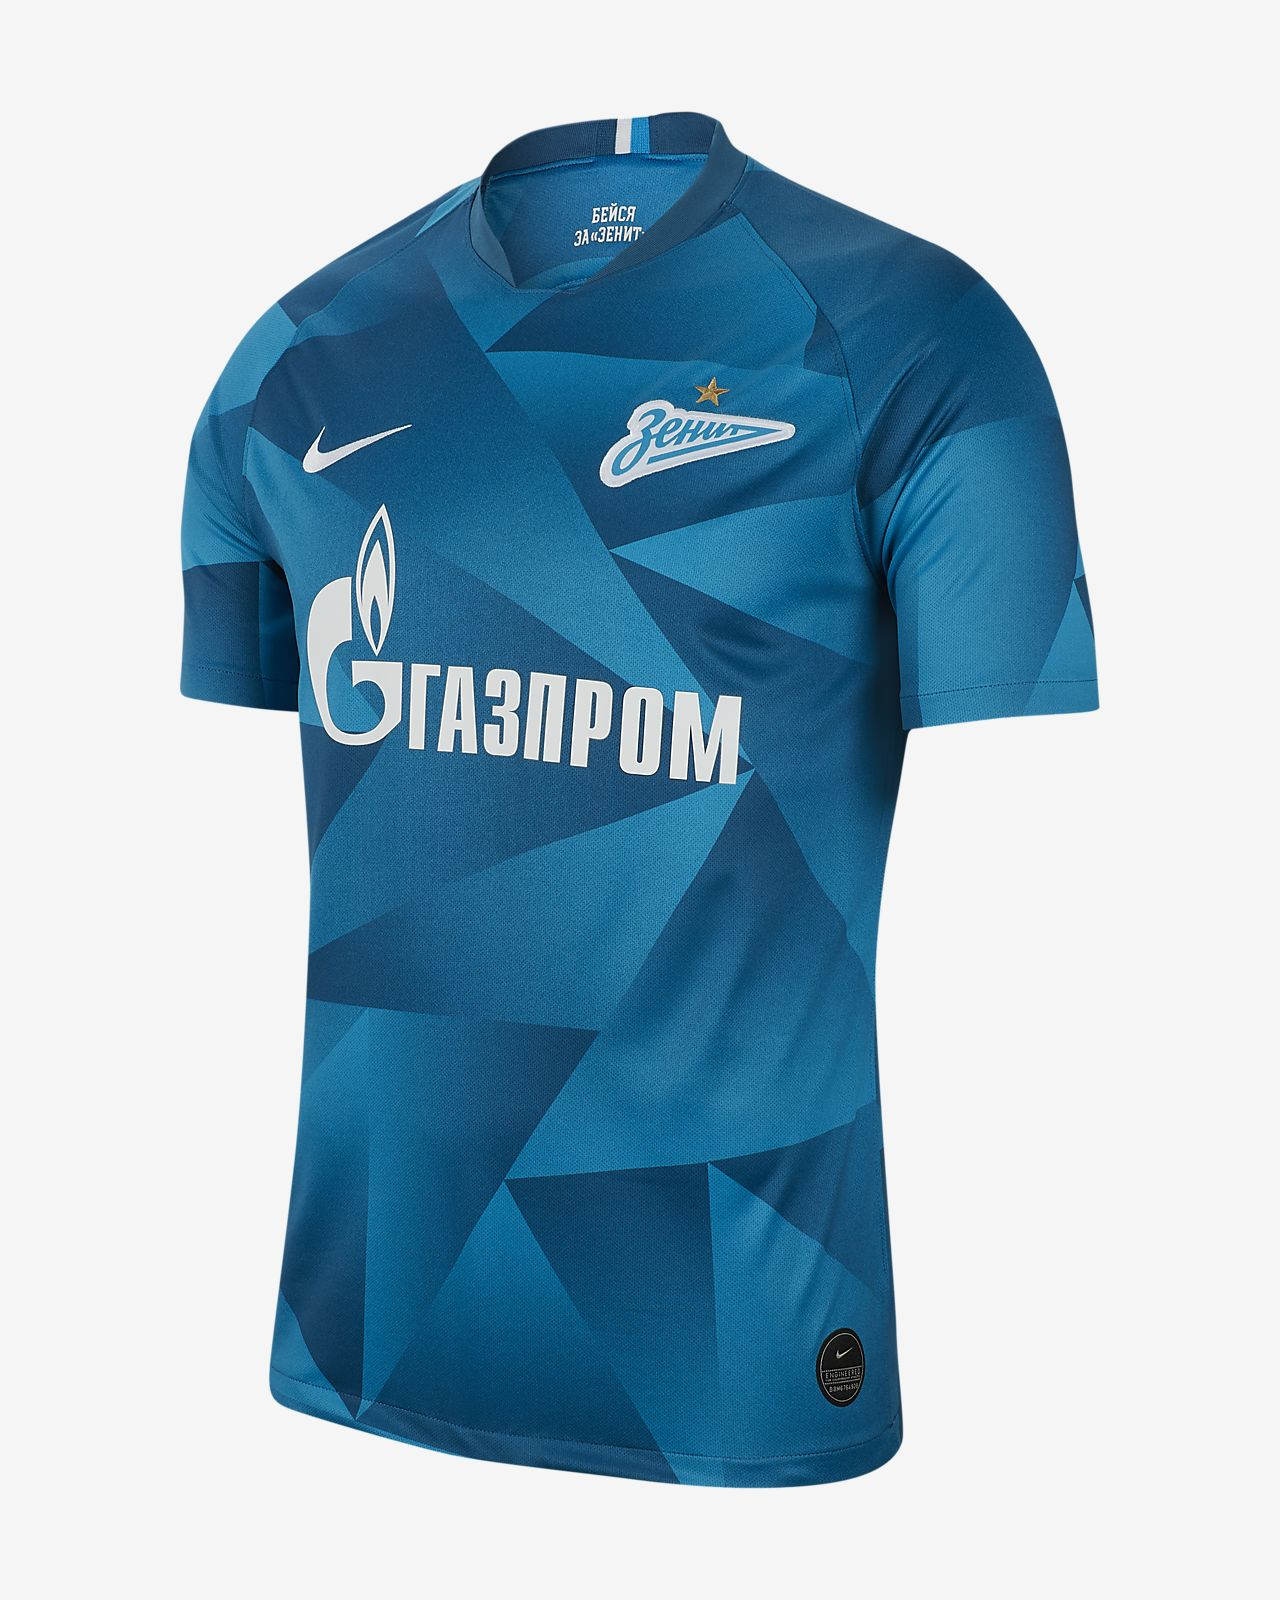 Zenit Saint Petersburg 2019/20 Stadium Home Samarreta de futbol - Home